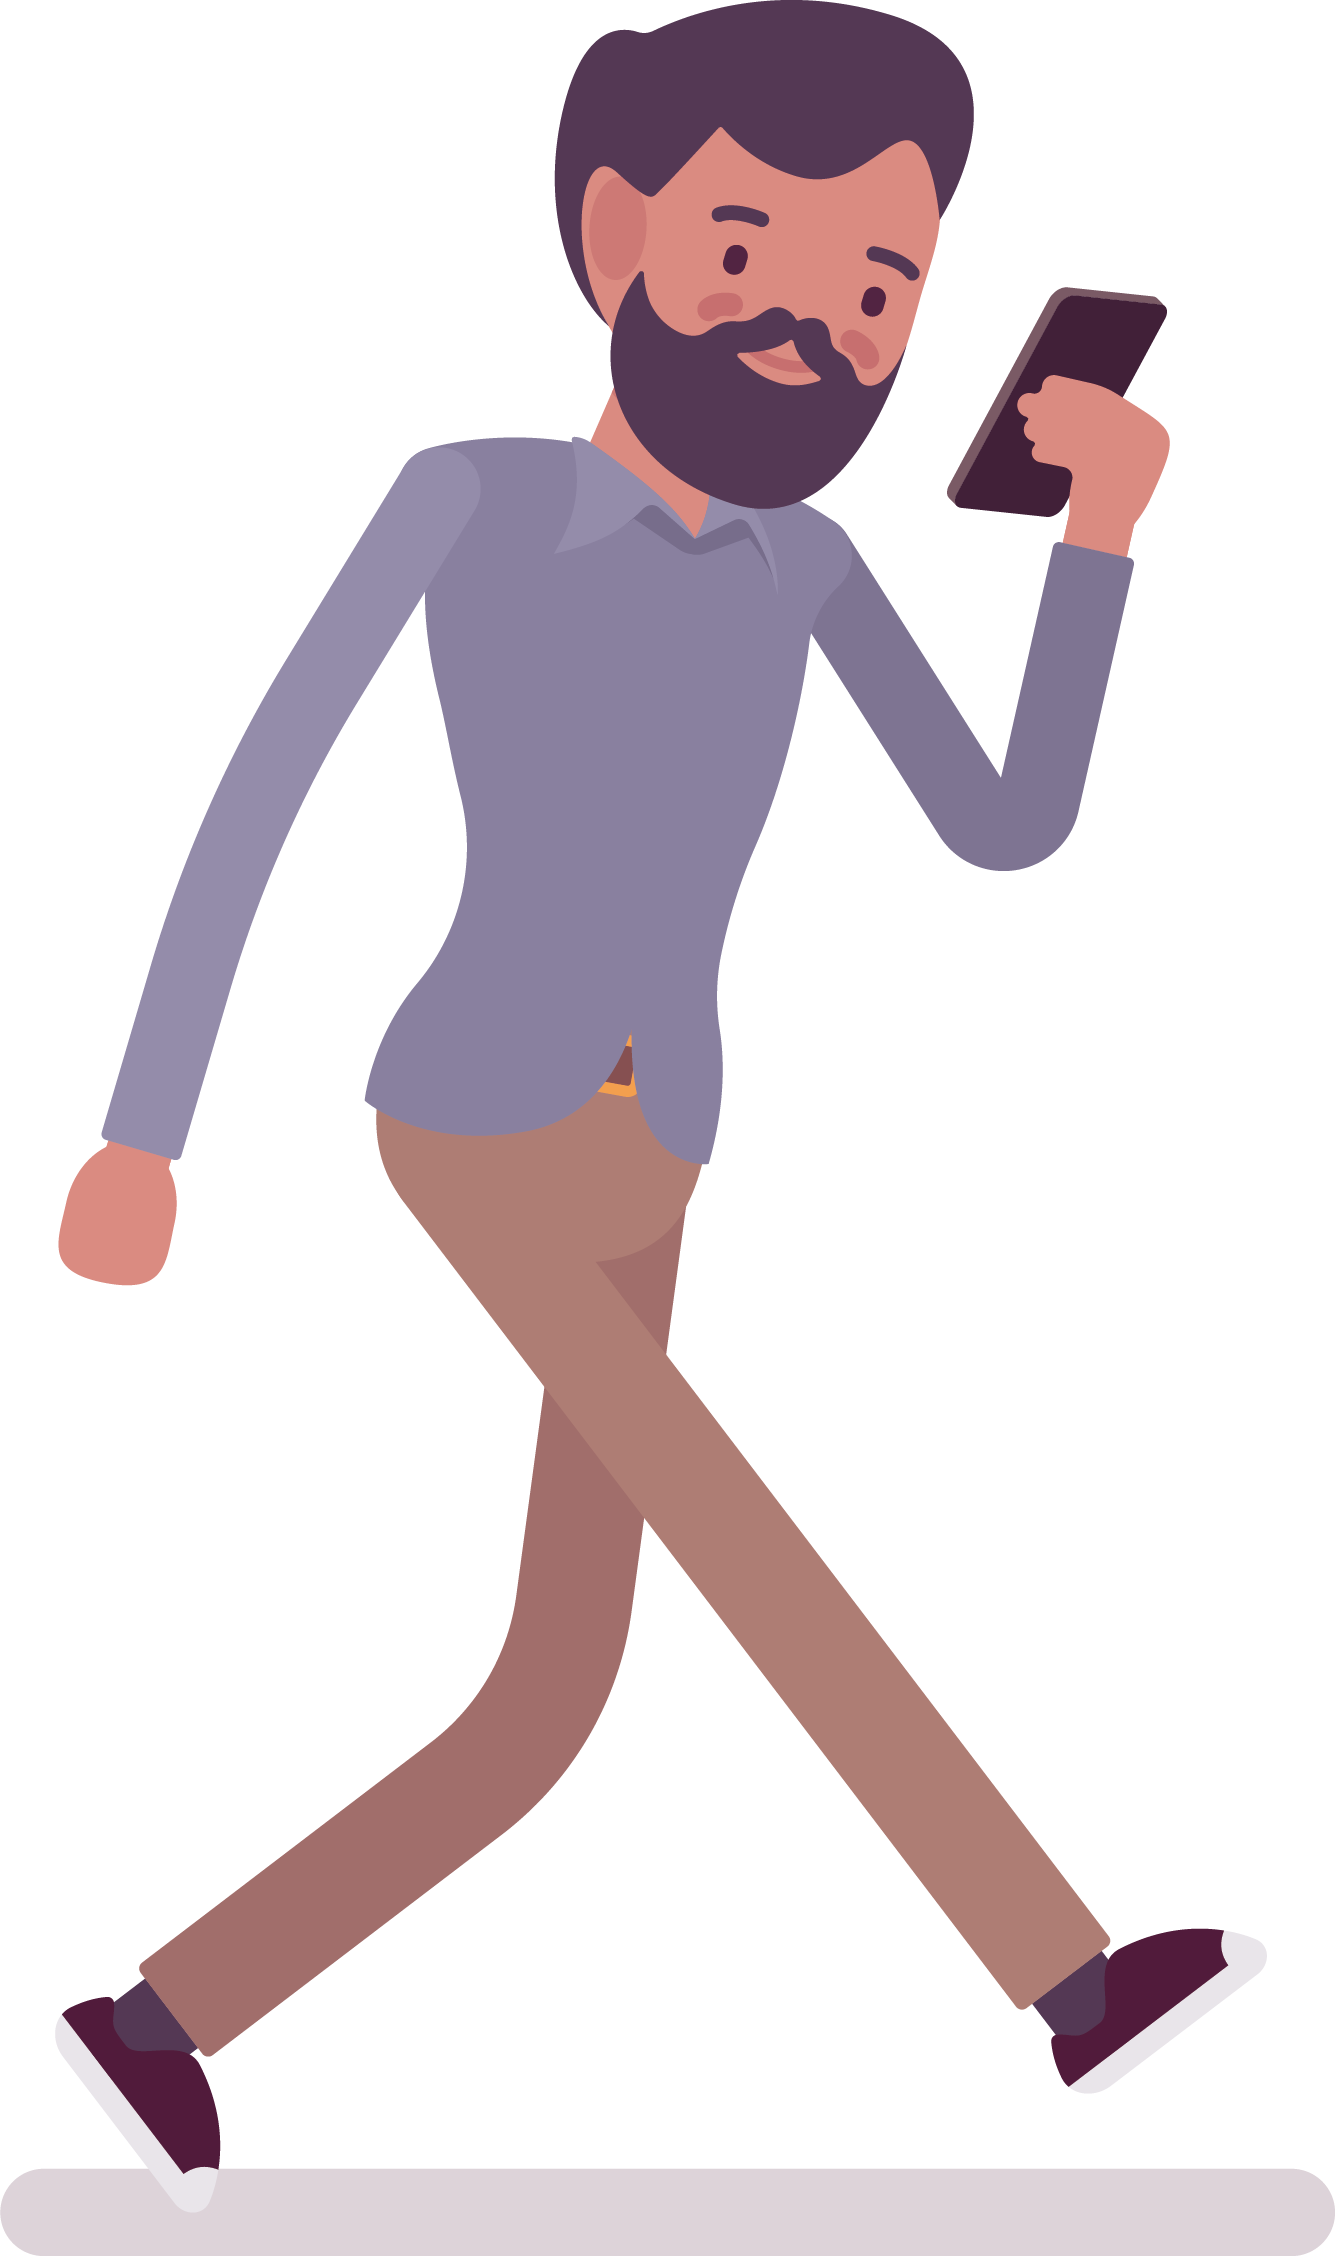 Cartoon looking at cell. Clipart walking man illustration